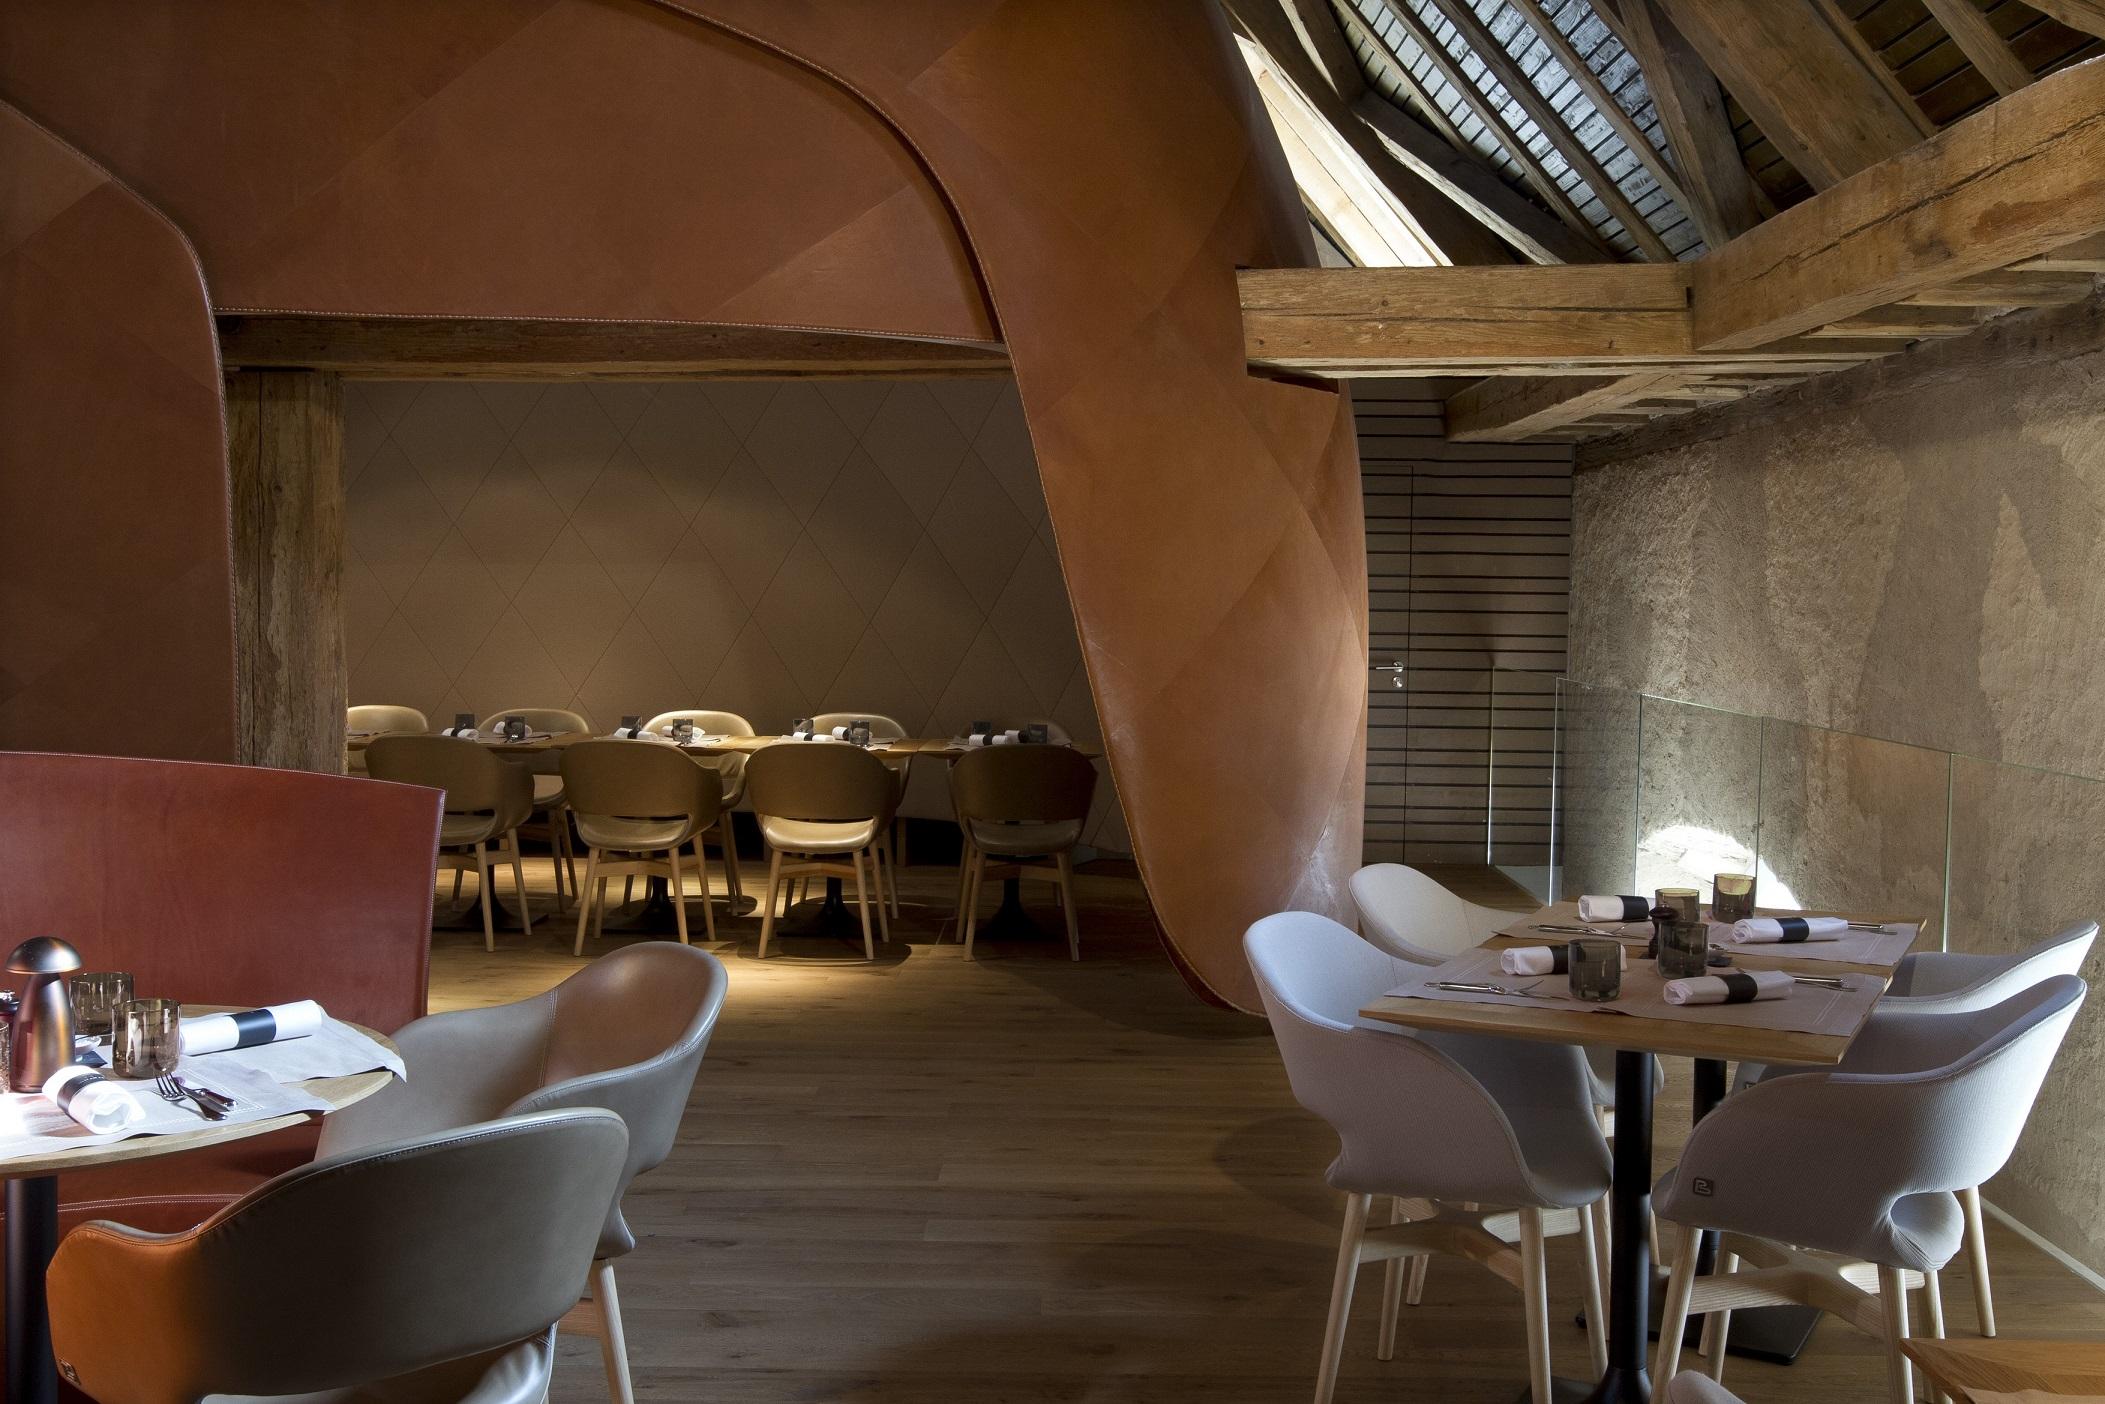 Restaurants Brasserie Les Haras for your conference in Strasbourg | SCB